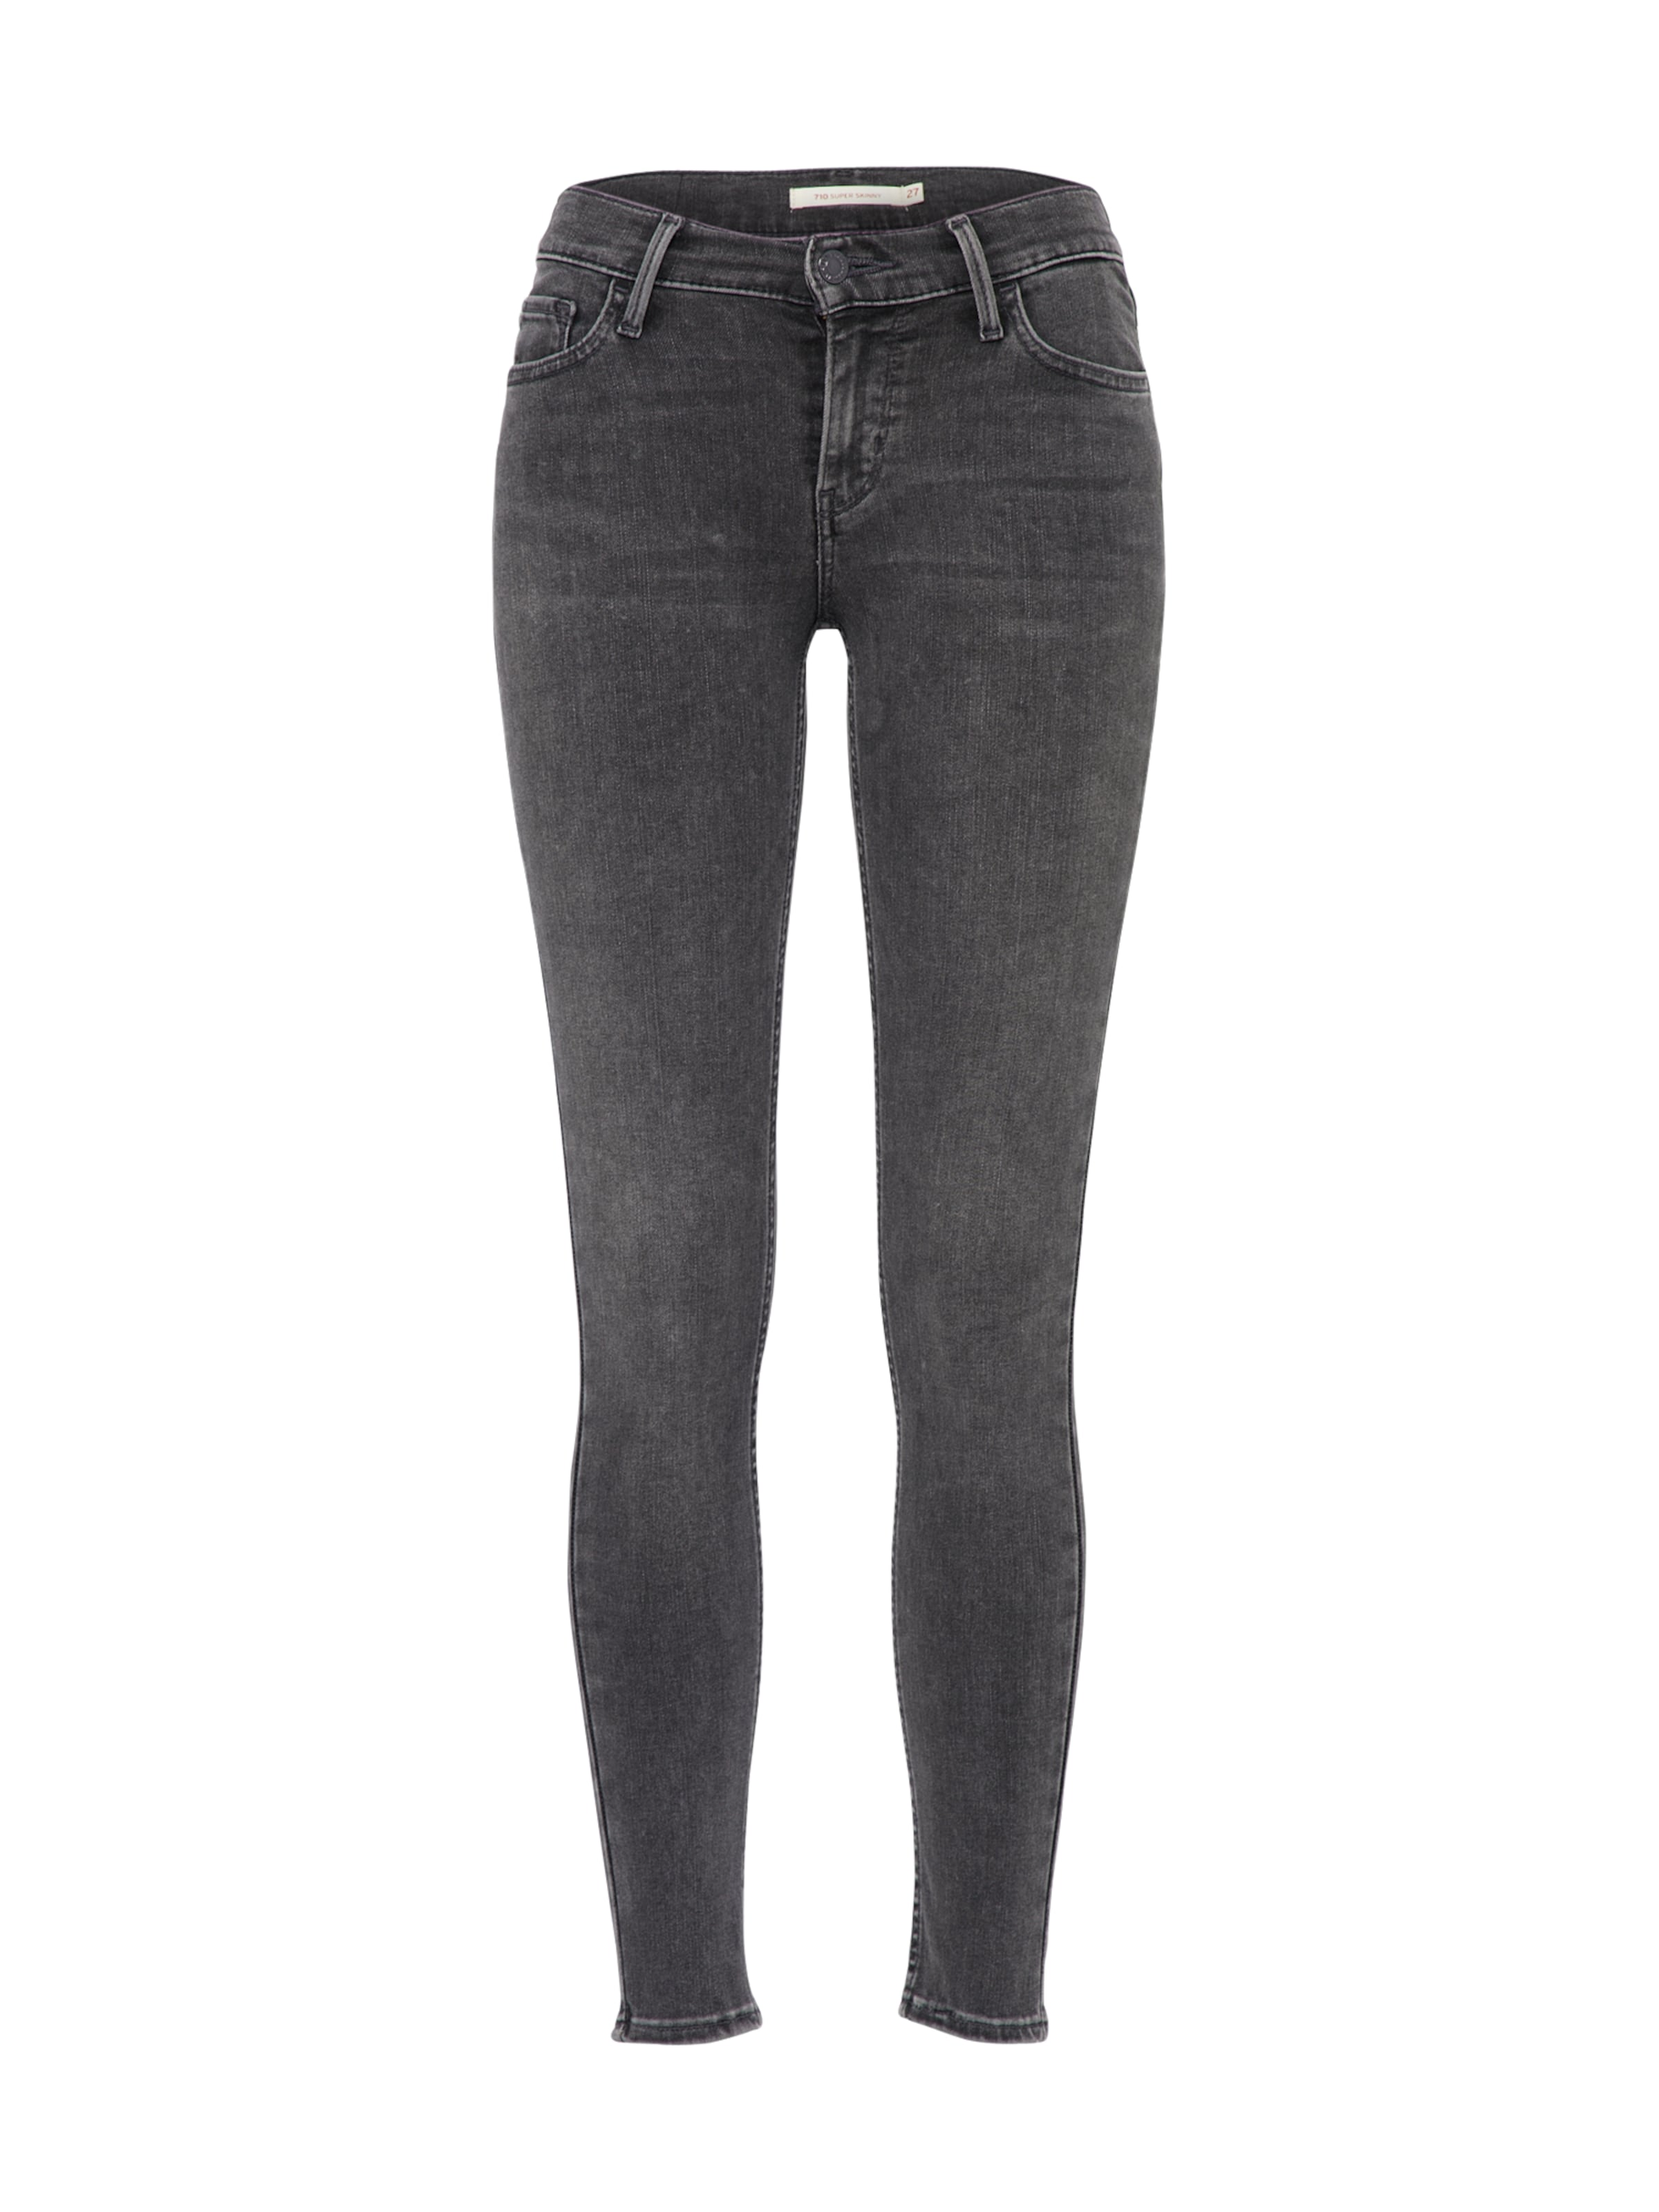 Super Skinny' Denim Levi's '710 In Innovation Grey Jeans sQtdChr